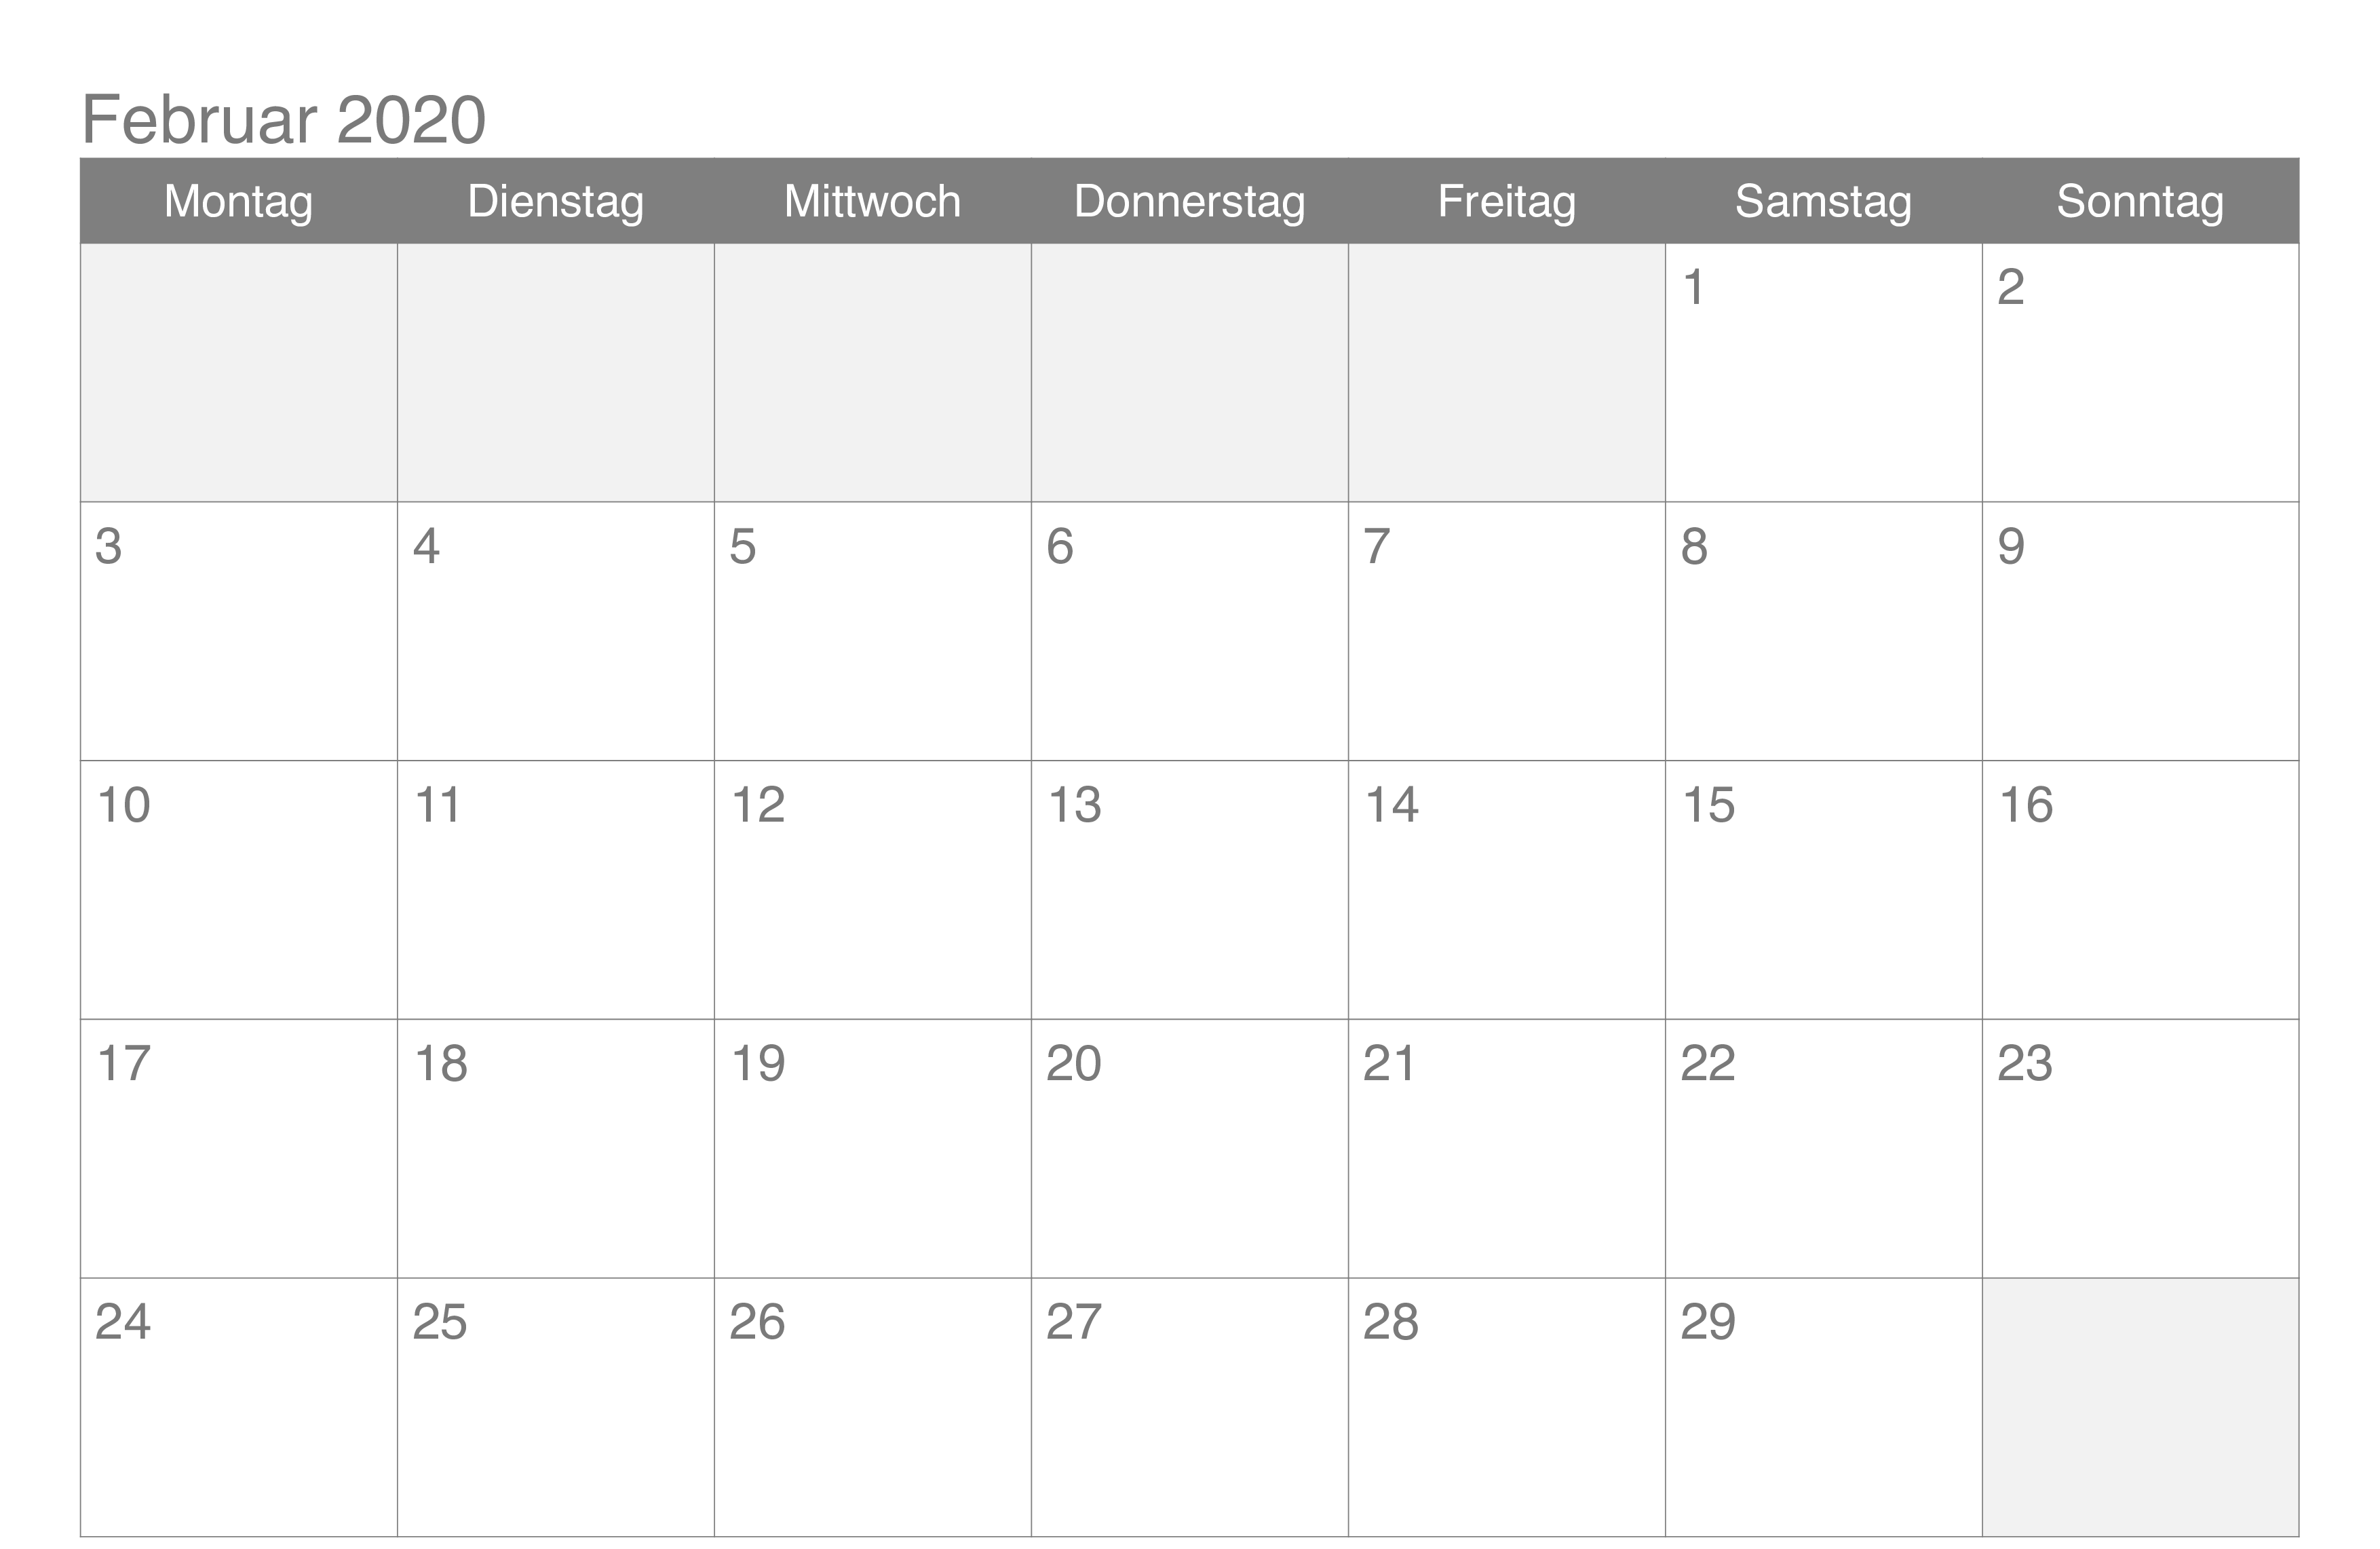 Februar 2020 Kalender